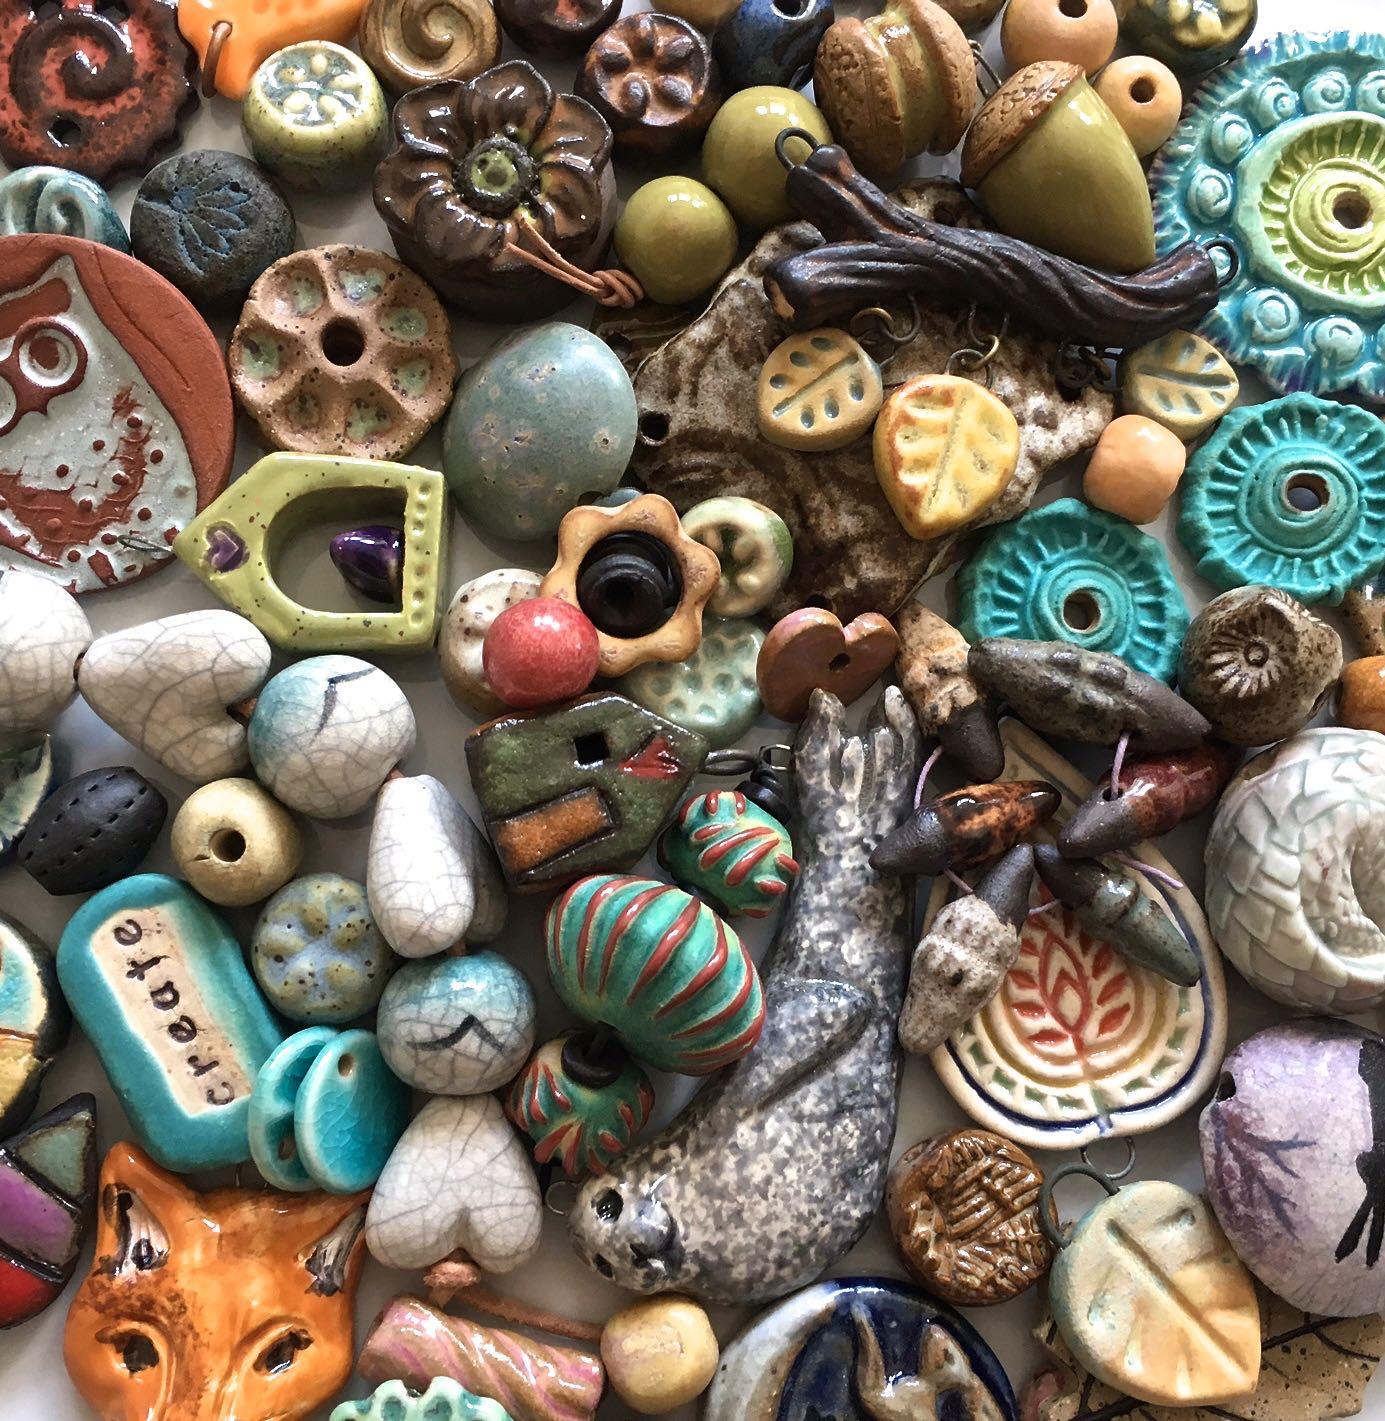 Ceramic Bead Beads: » Ceramic Art Bead Buying Guide